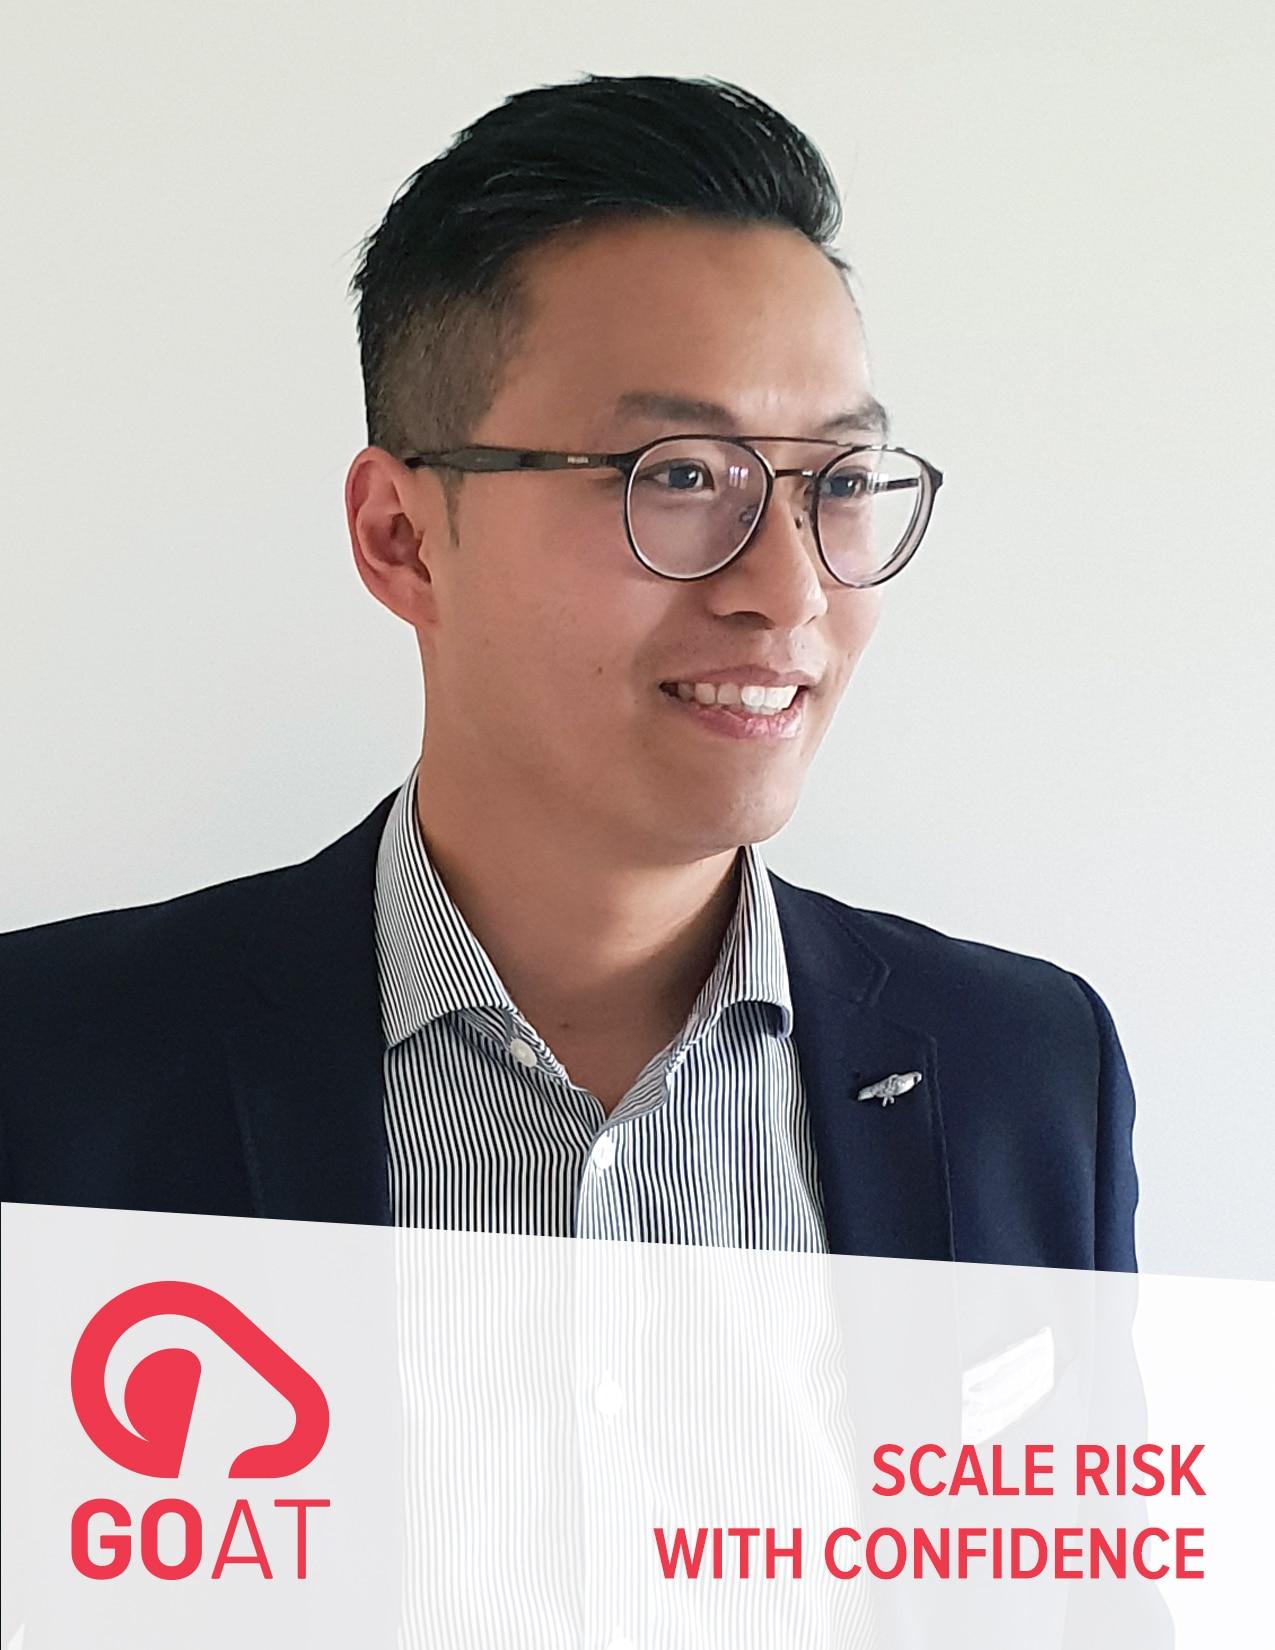 CEO GOAT Danny Wong